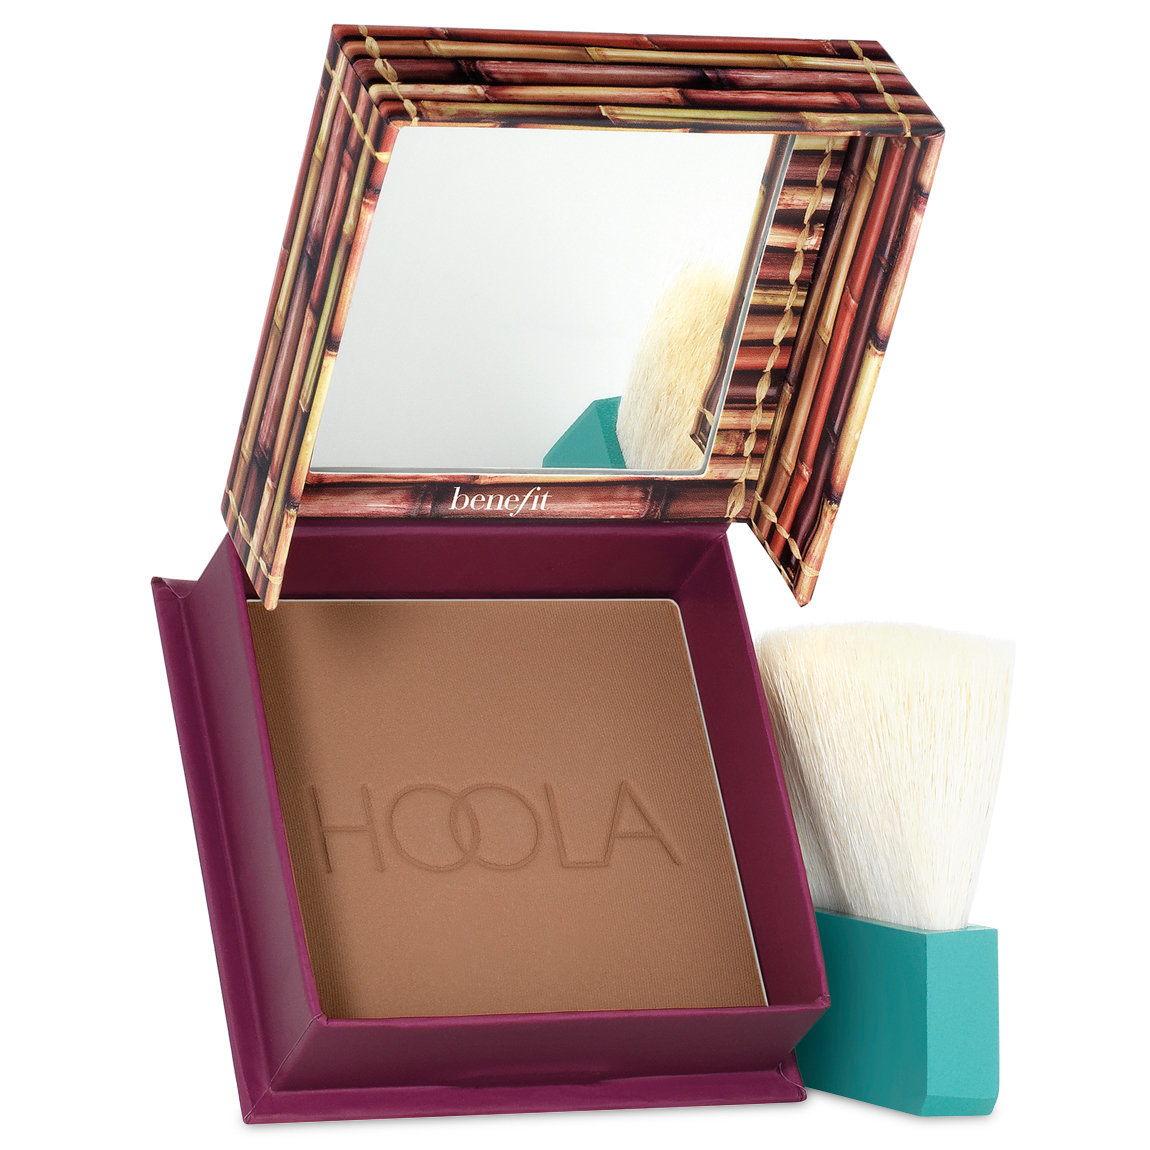 Benefit Cosmetics Hoola Matte Bronzer Jumbo product swatch.